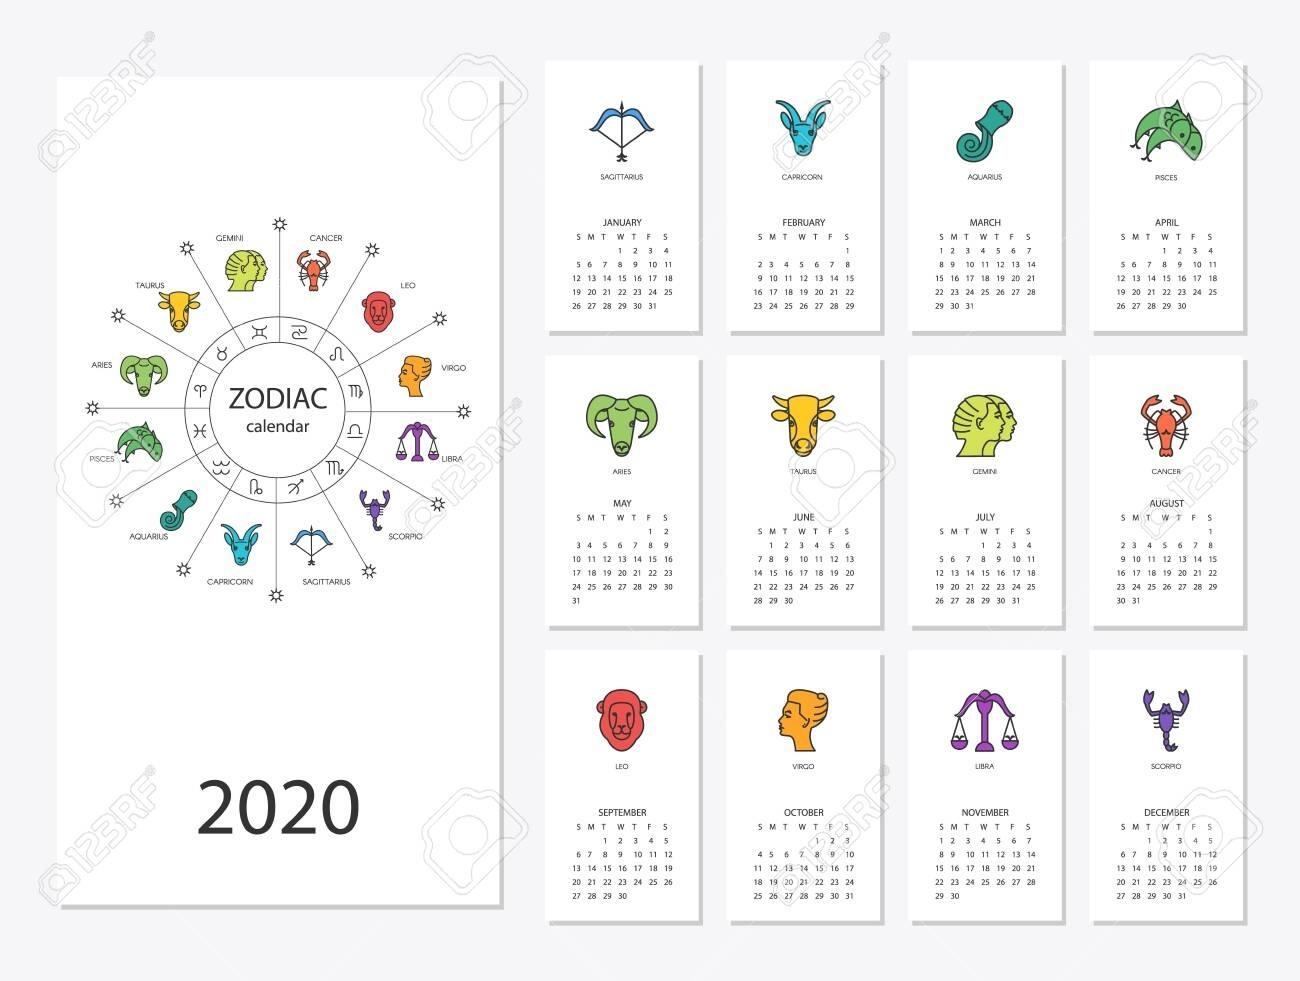 Calendar 2020 With Horoscope Signs Zodiac Symbols Set English Calendar Zodiac Signs